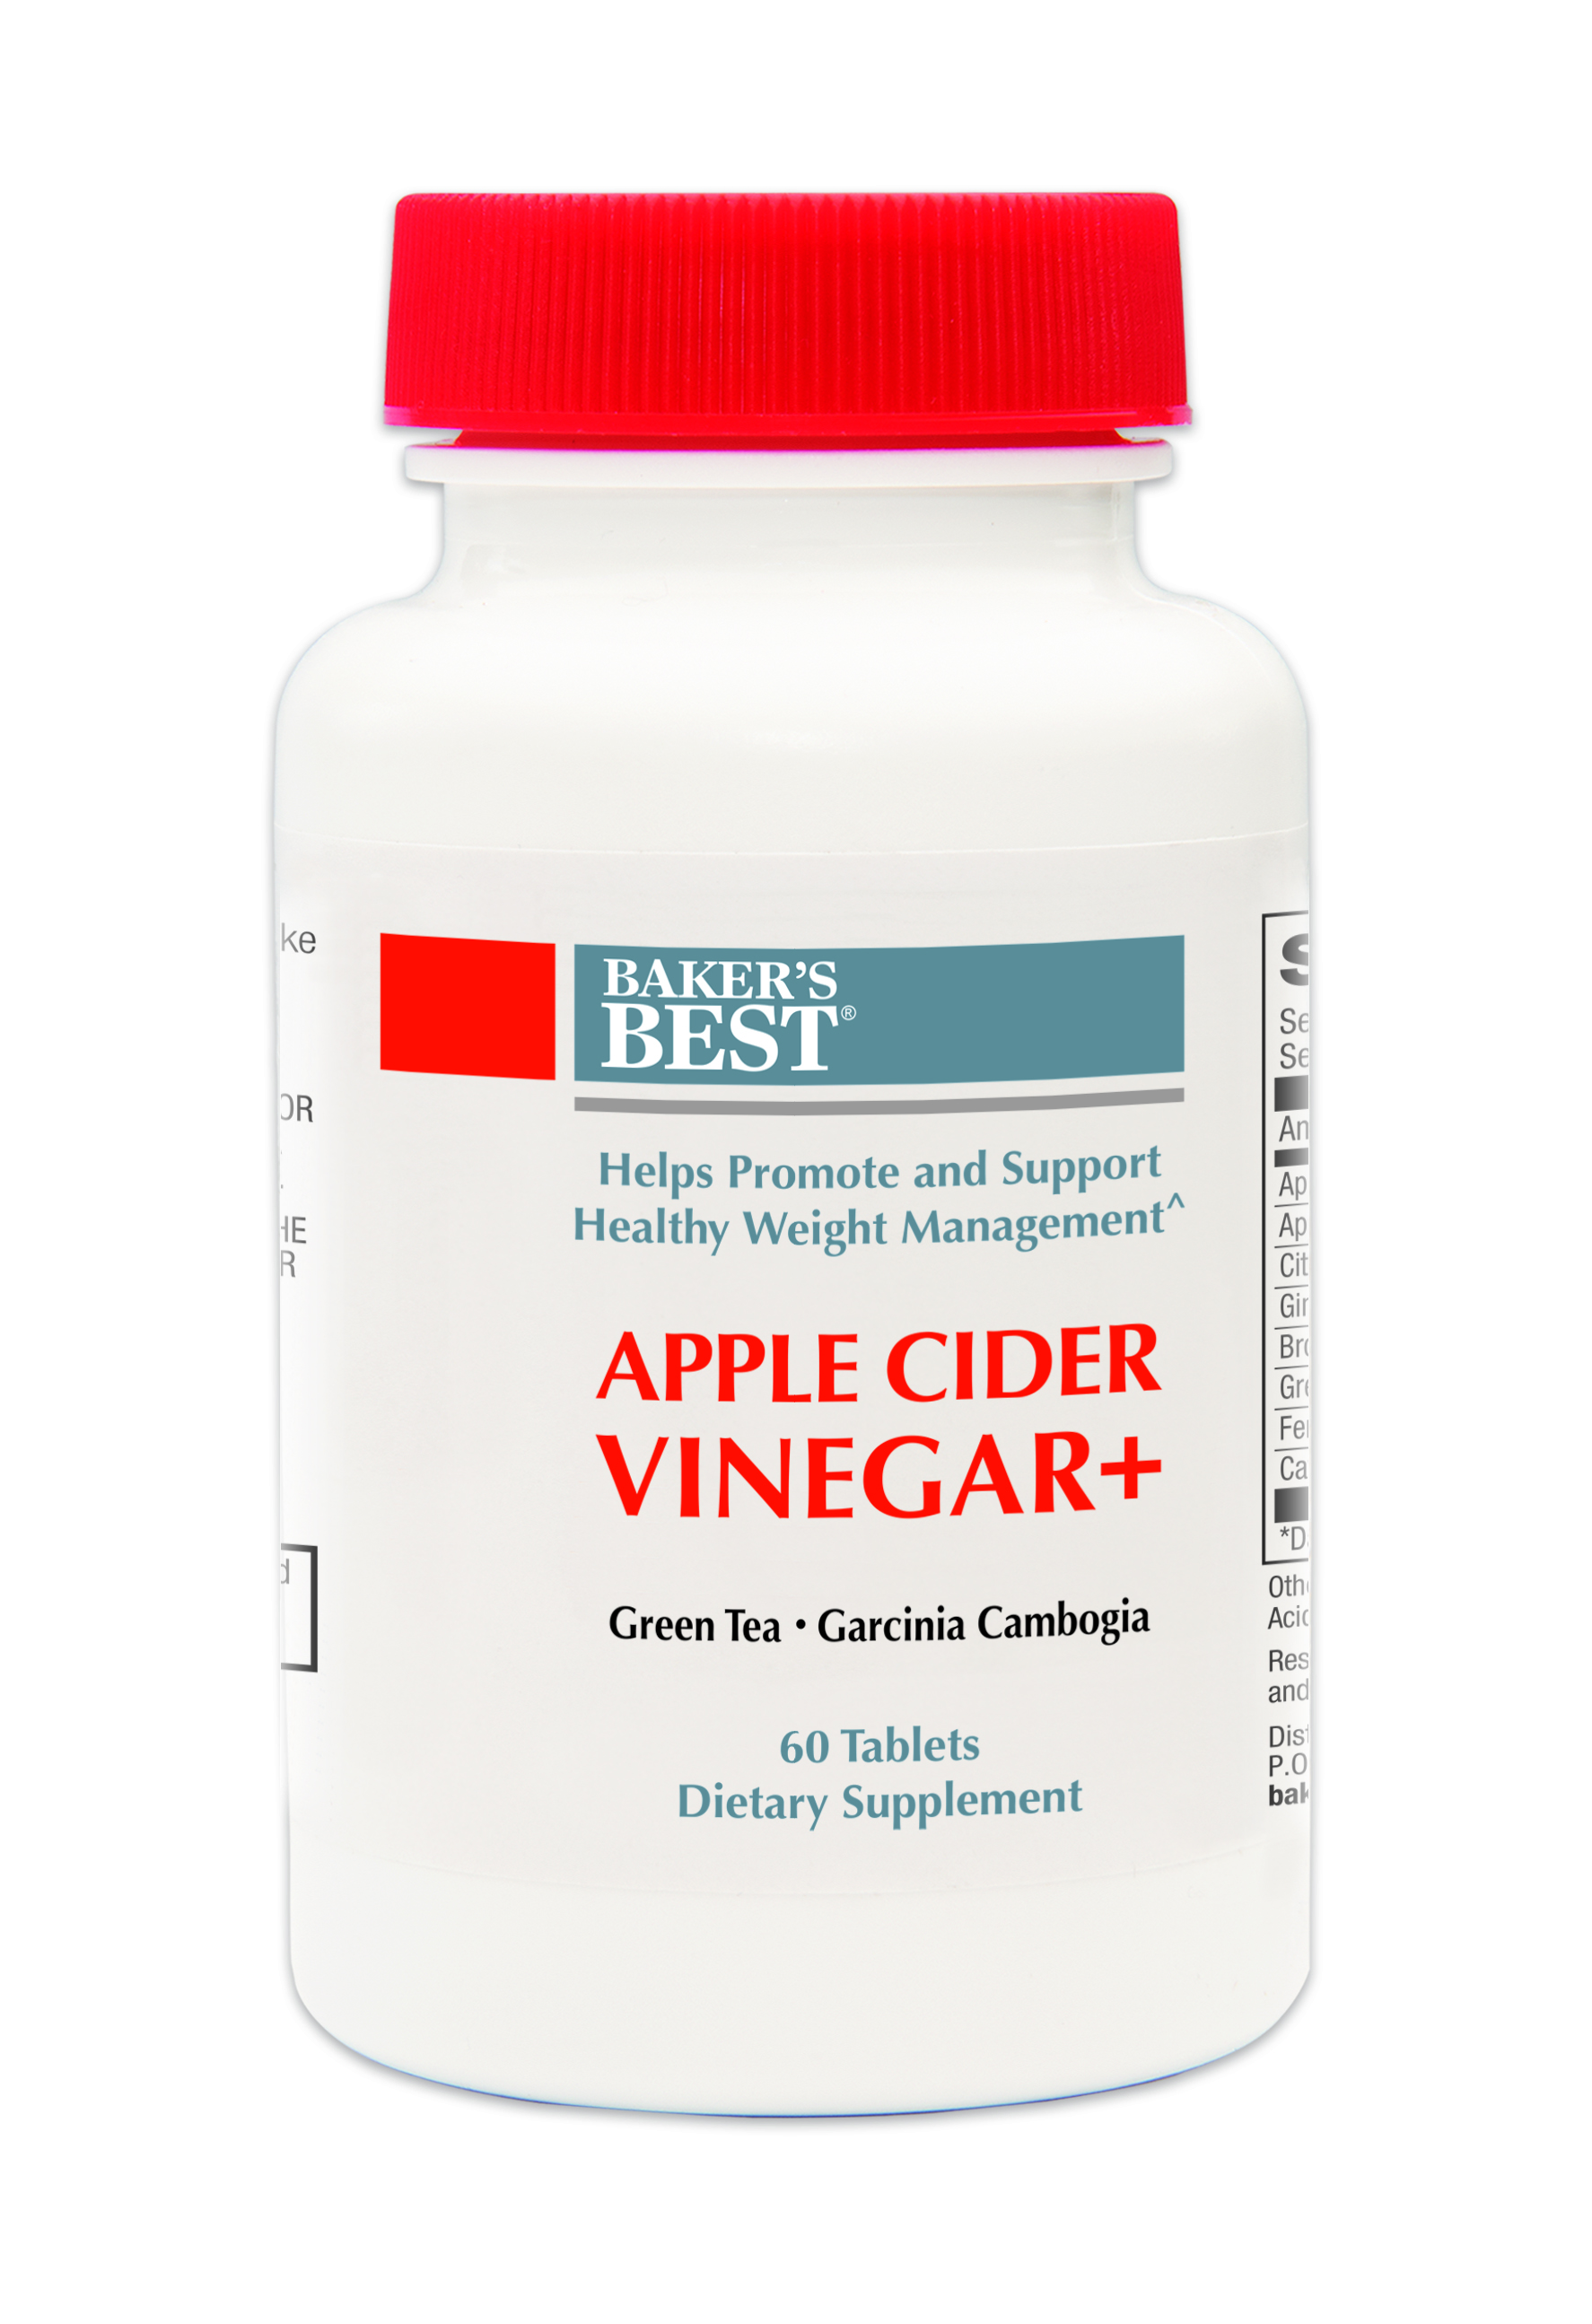 Apple Cider Vinegar+